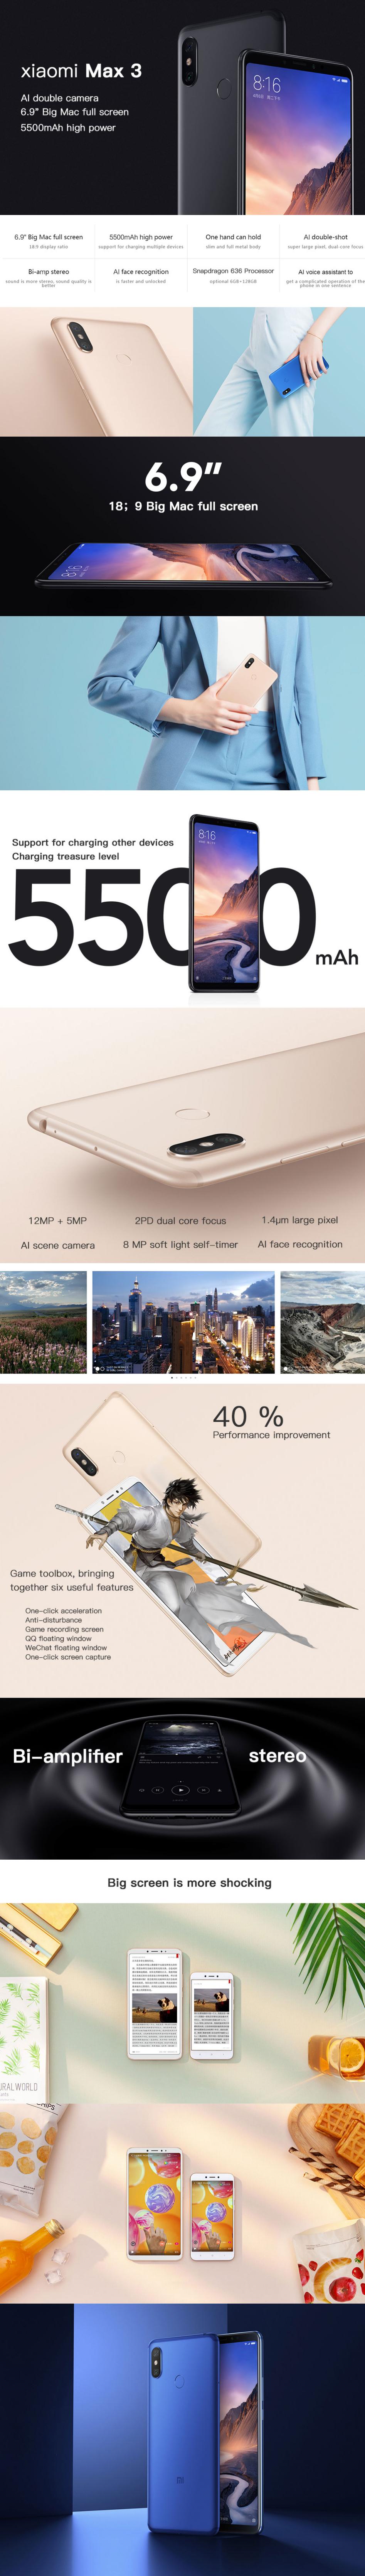 screencapture-aliexpress-item-Original-Xiaomi-Mi-Max-3-6GB-RAM-128GB-ROM-Mobile-Phone-Snapdragon-636-Octa-Core-6-32897985587-html-2018-07-23-15_41_59e846bac7723c29ff.png